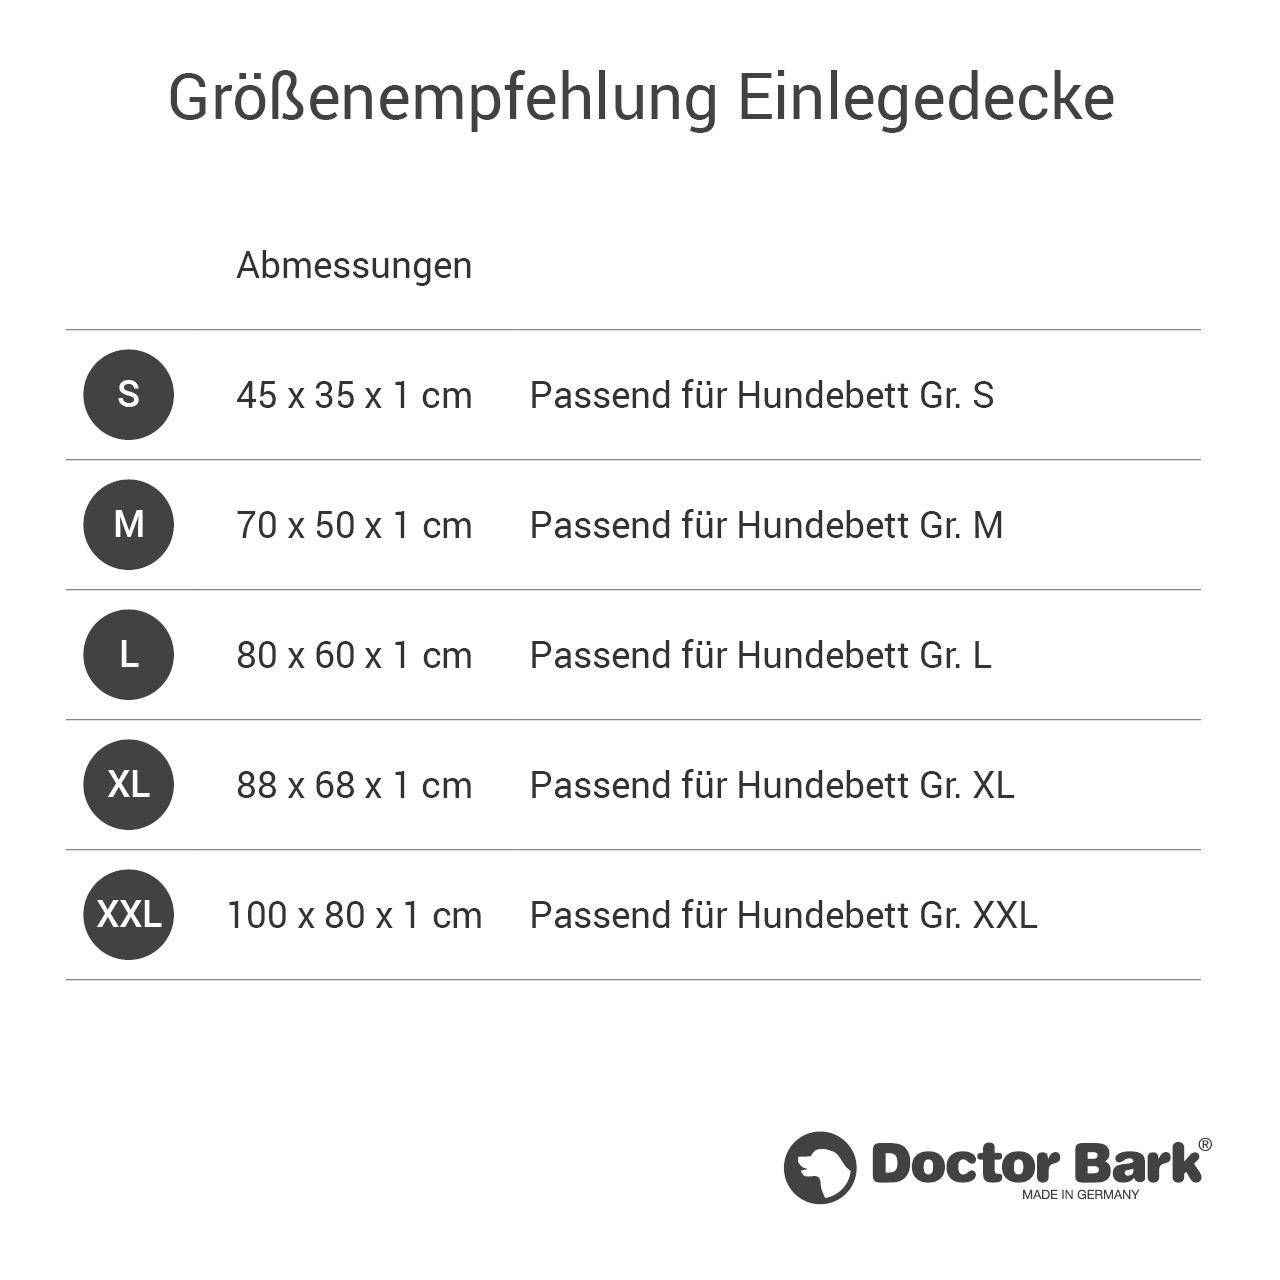 gepolsterte Einlegedecke für Doctor Bark Hundebett Gr. S - grau